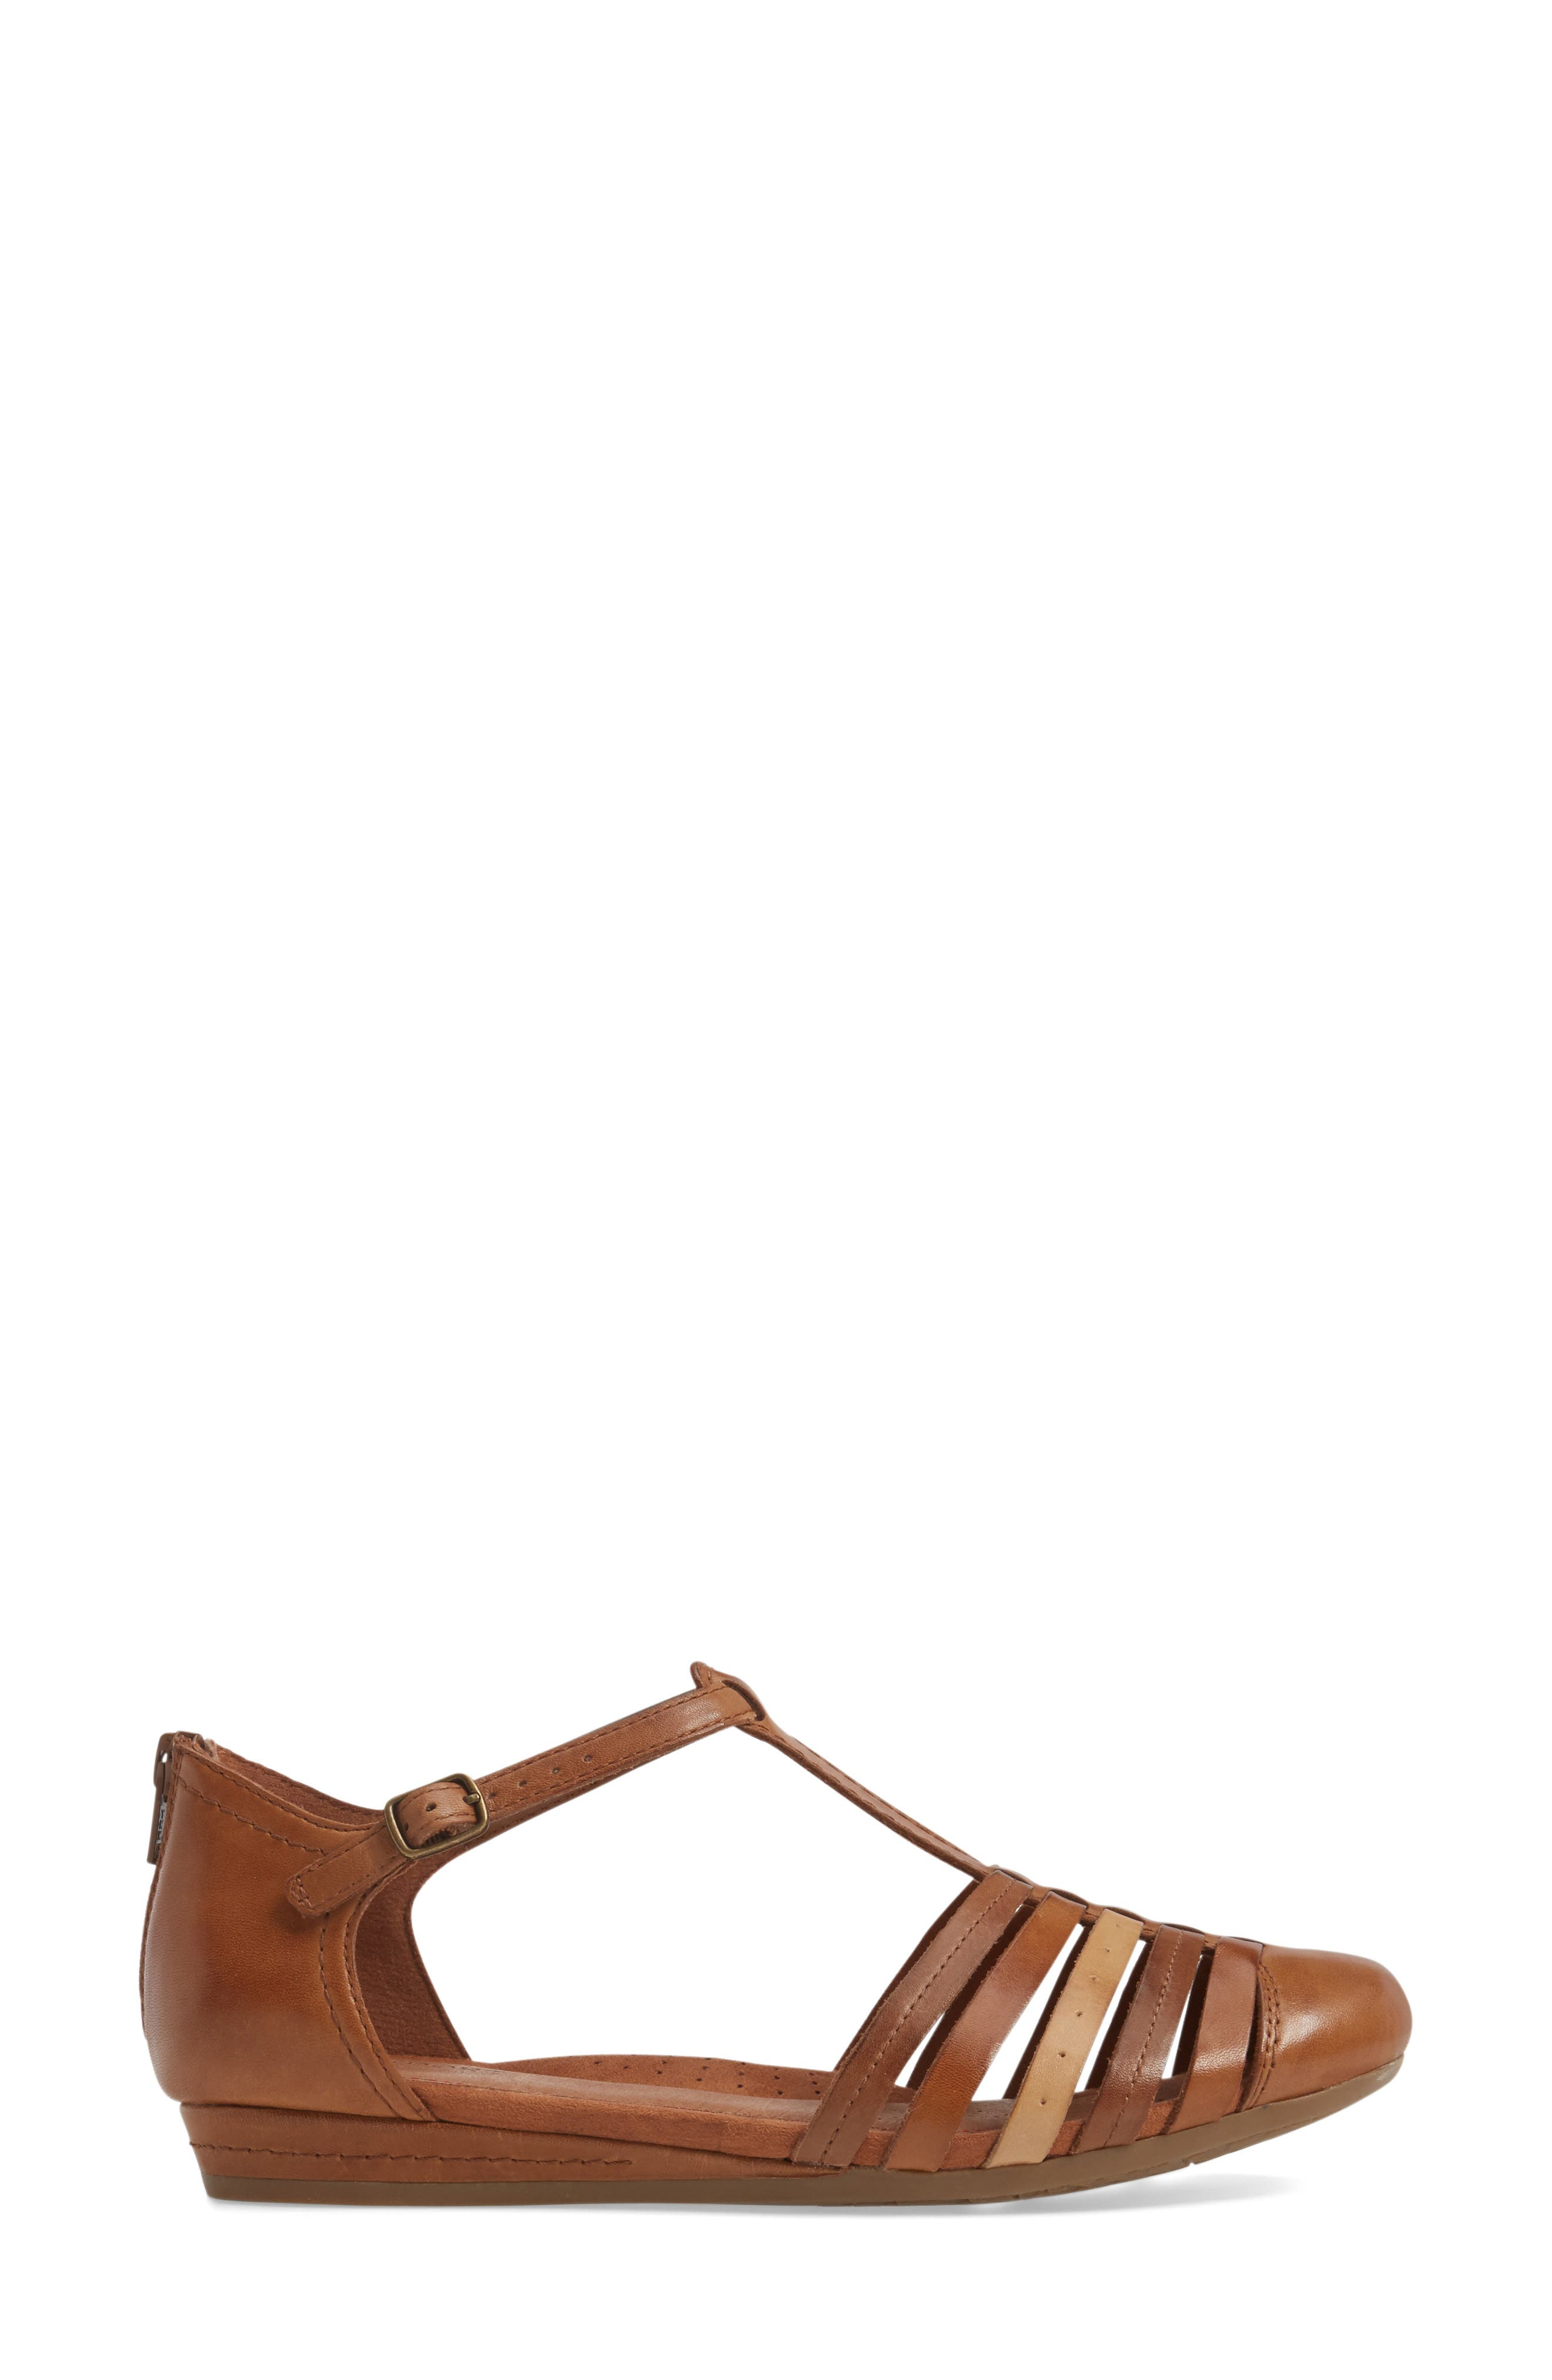 Alternate Image 3  - Rockport Cobb Hill Galway T-Strap Sandal (Women)